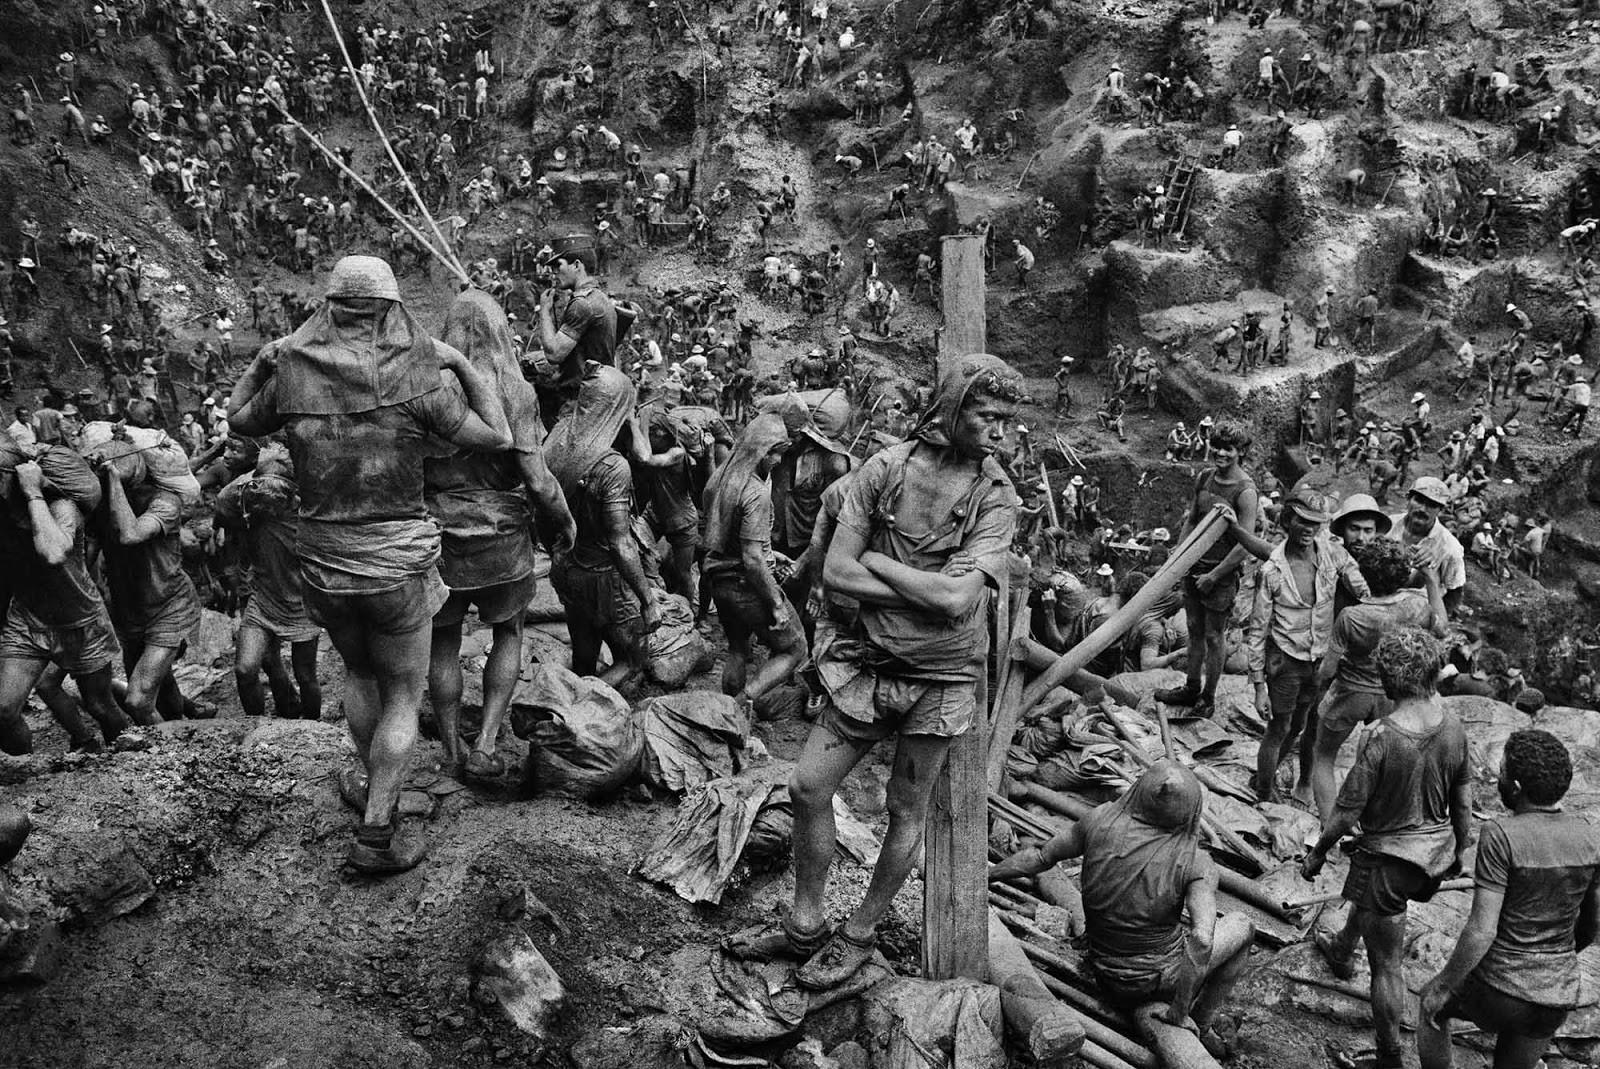 The hell of Sierra Pelada mines, 1980s (